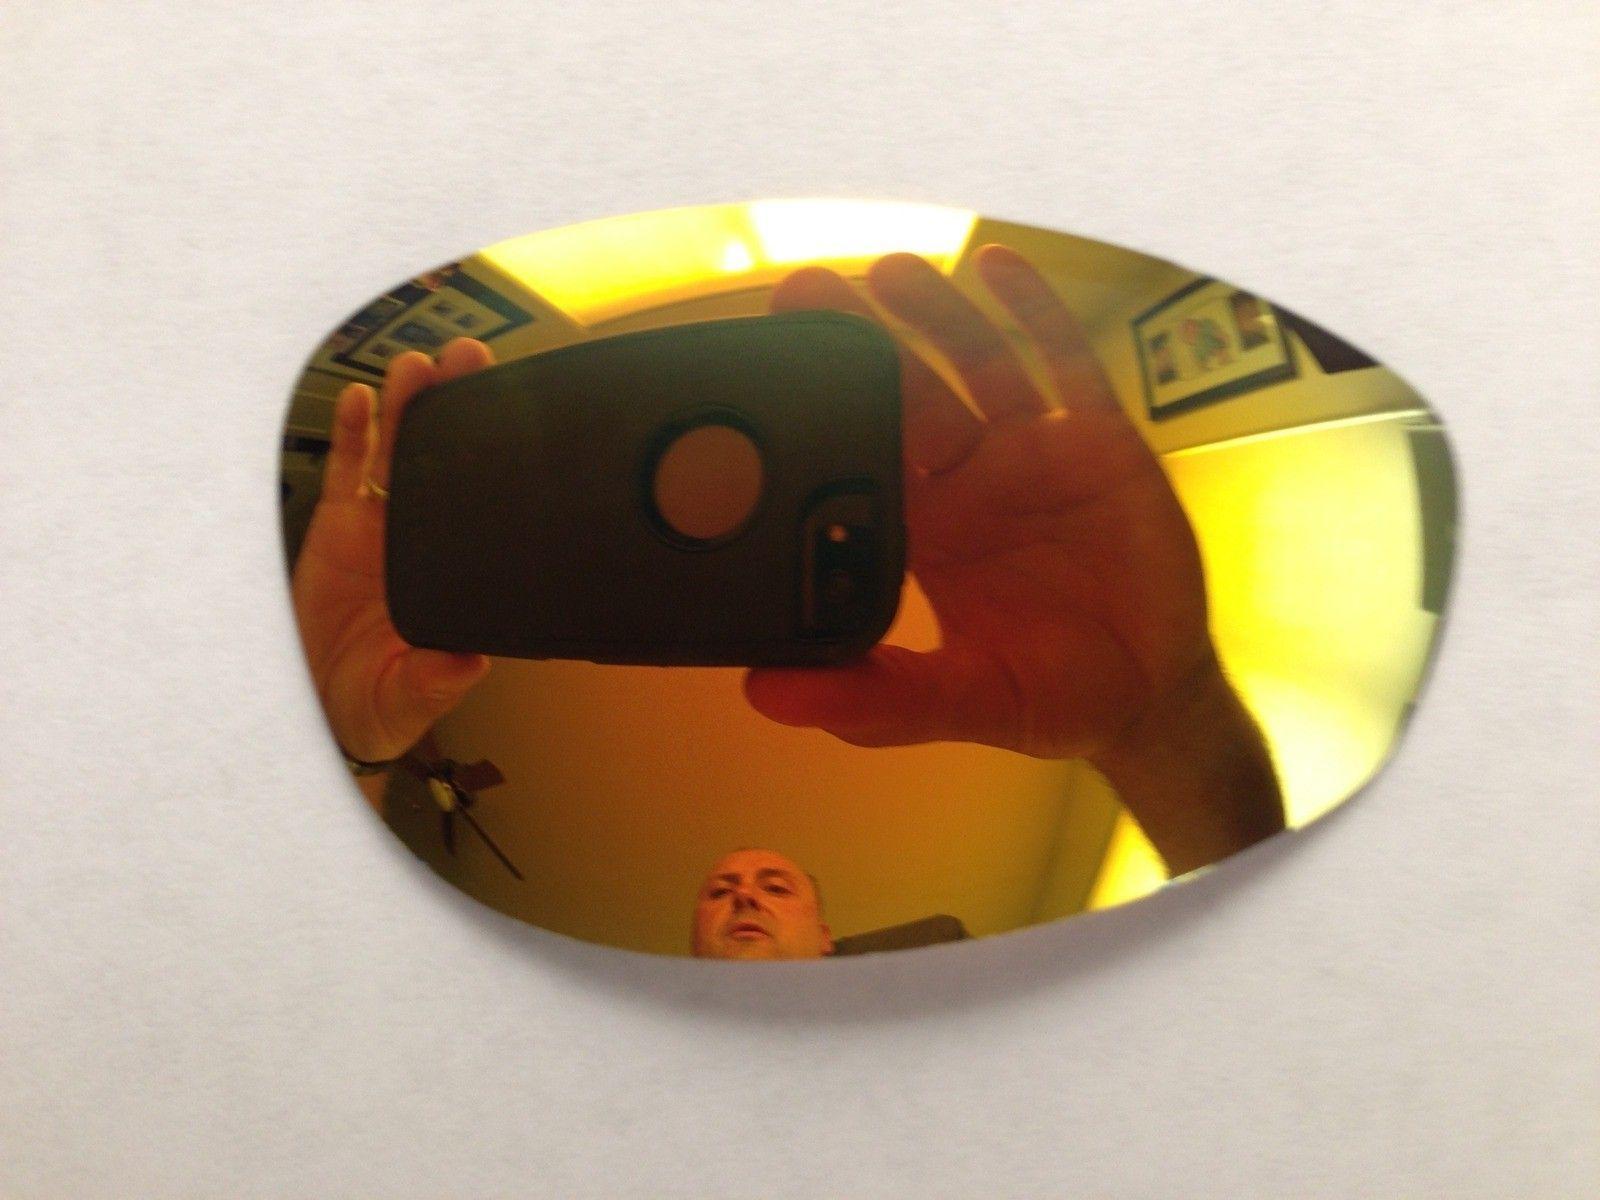 Fire Polarized Original Straight Jacket Lenses - vBqlf8.jpg